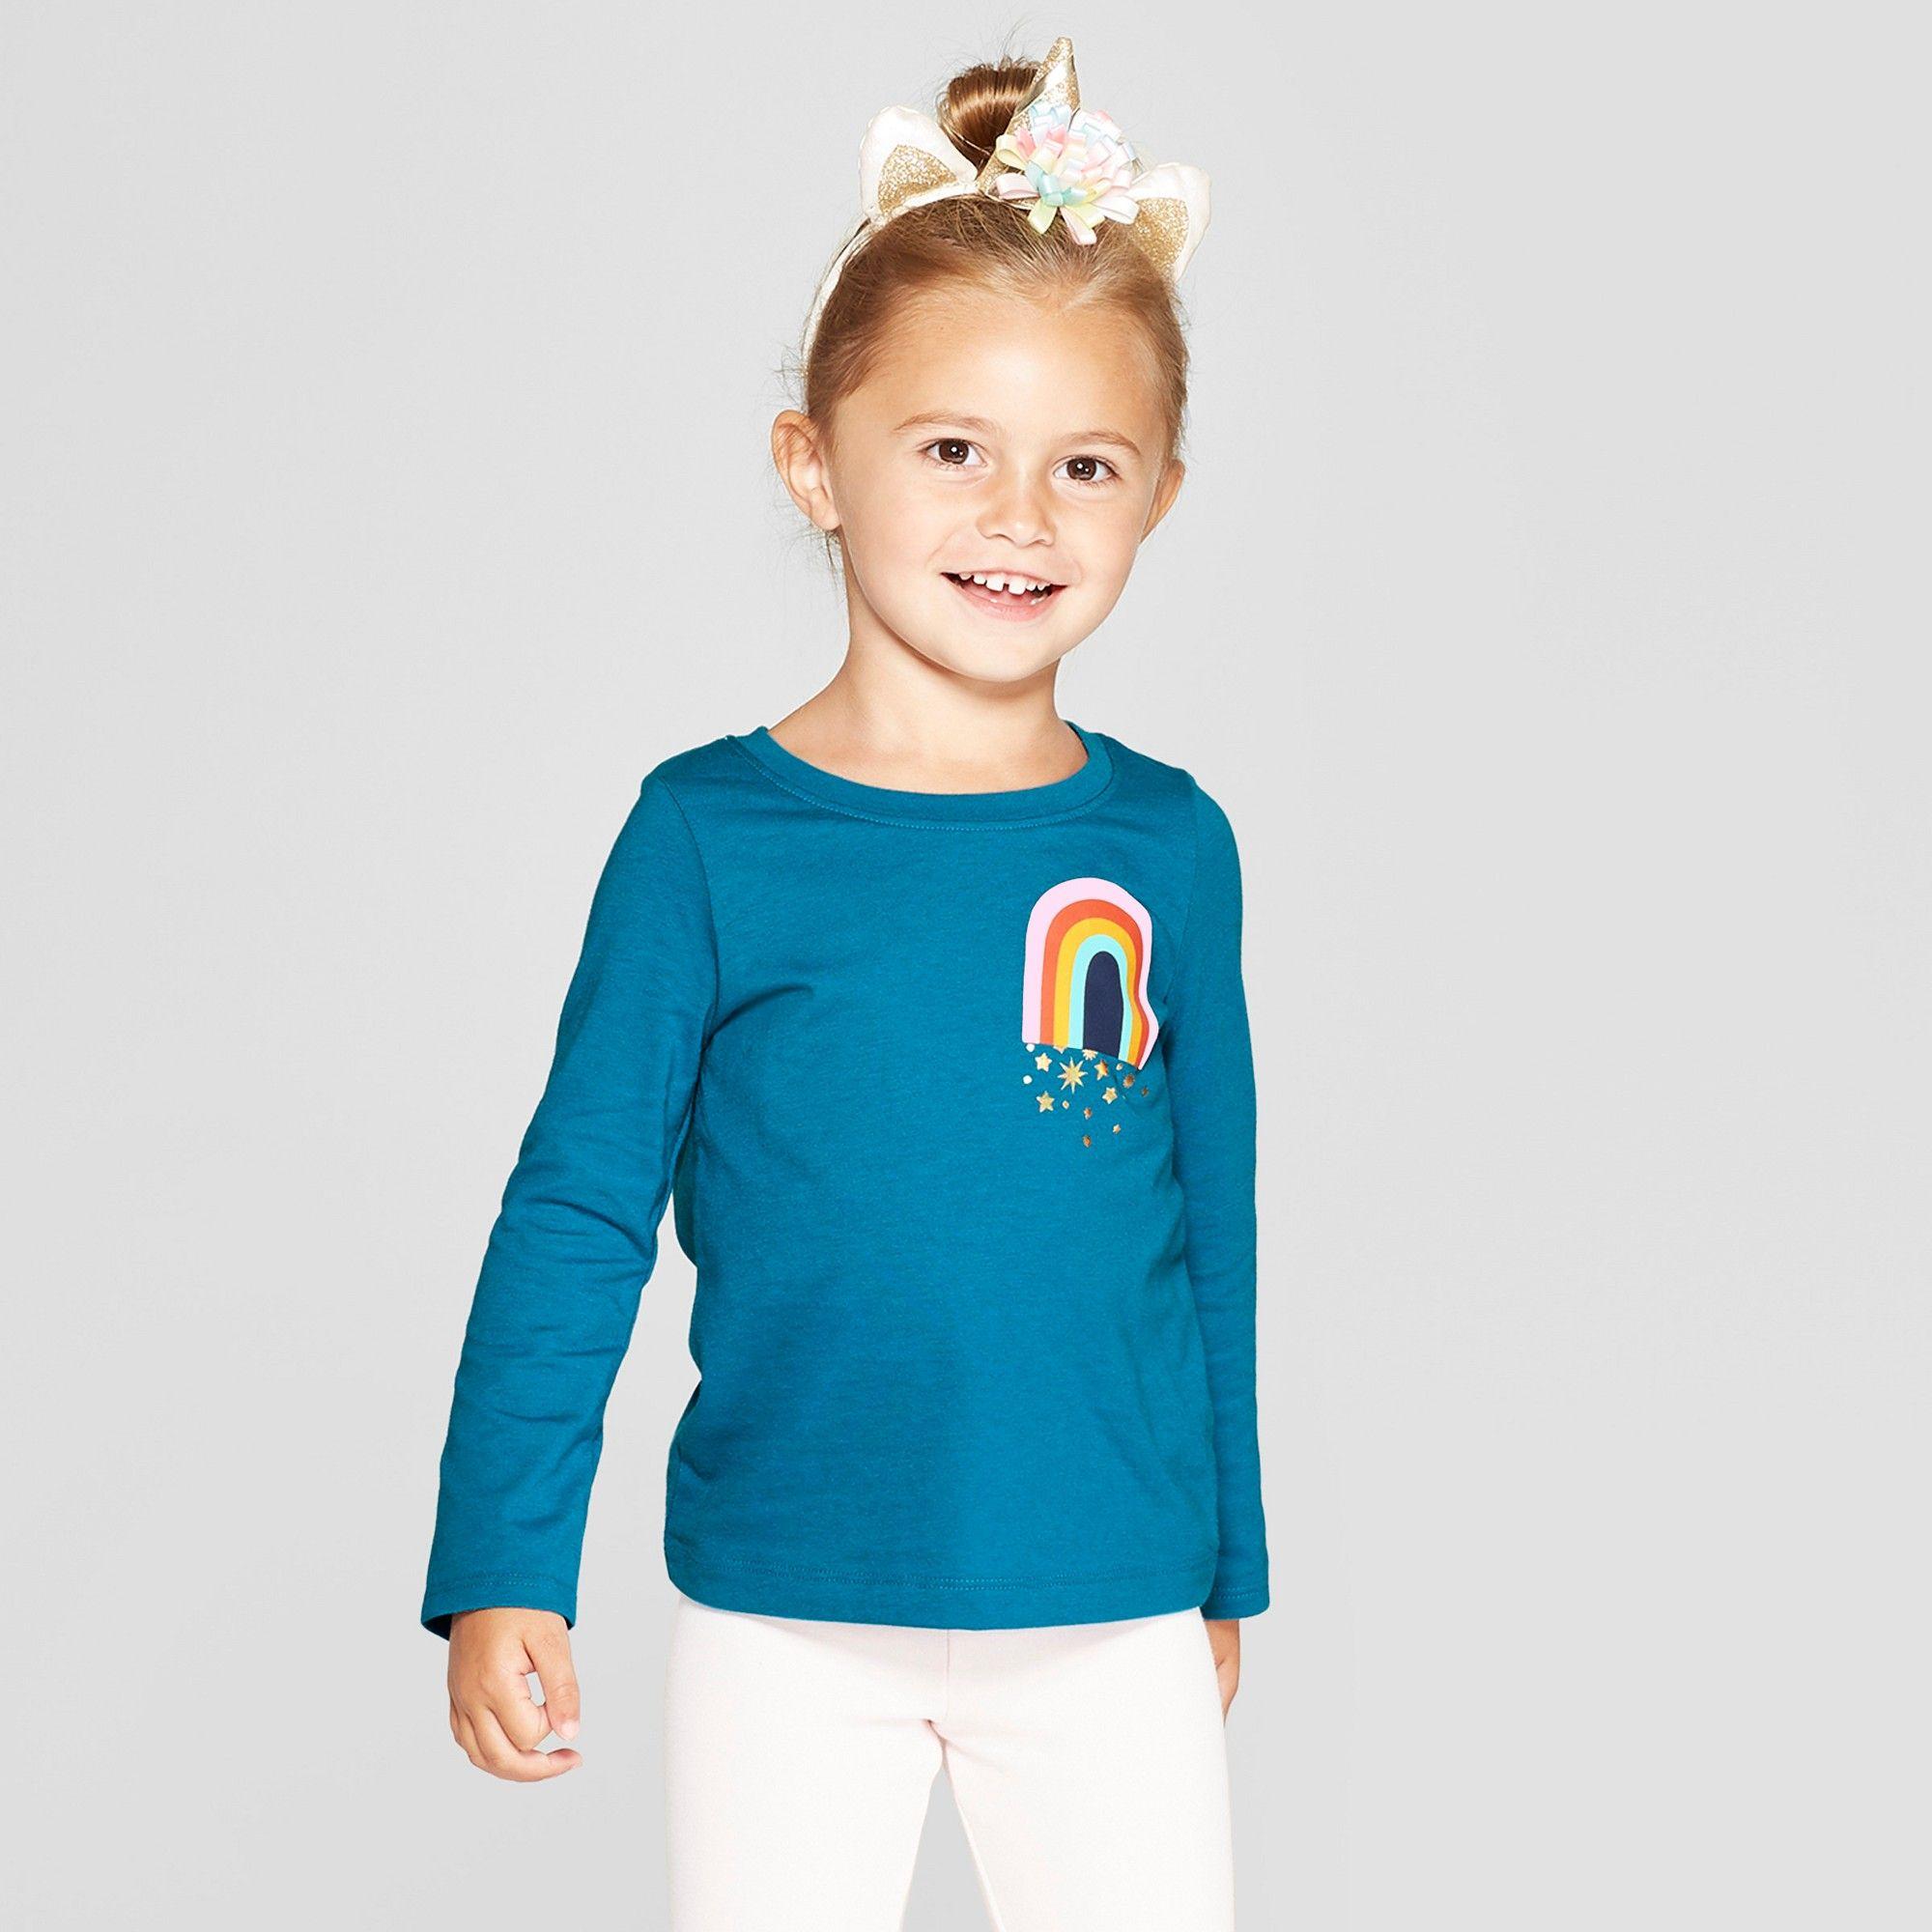 929732e3 Toddler Girls' Long Sleeve 'Rainbow' Graphic T-Shirt - Cat & Jack Blue 18M